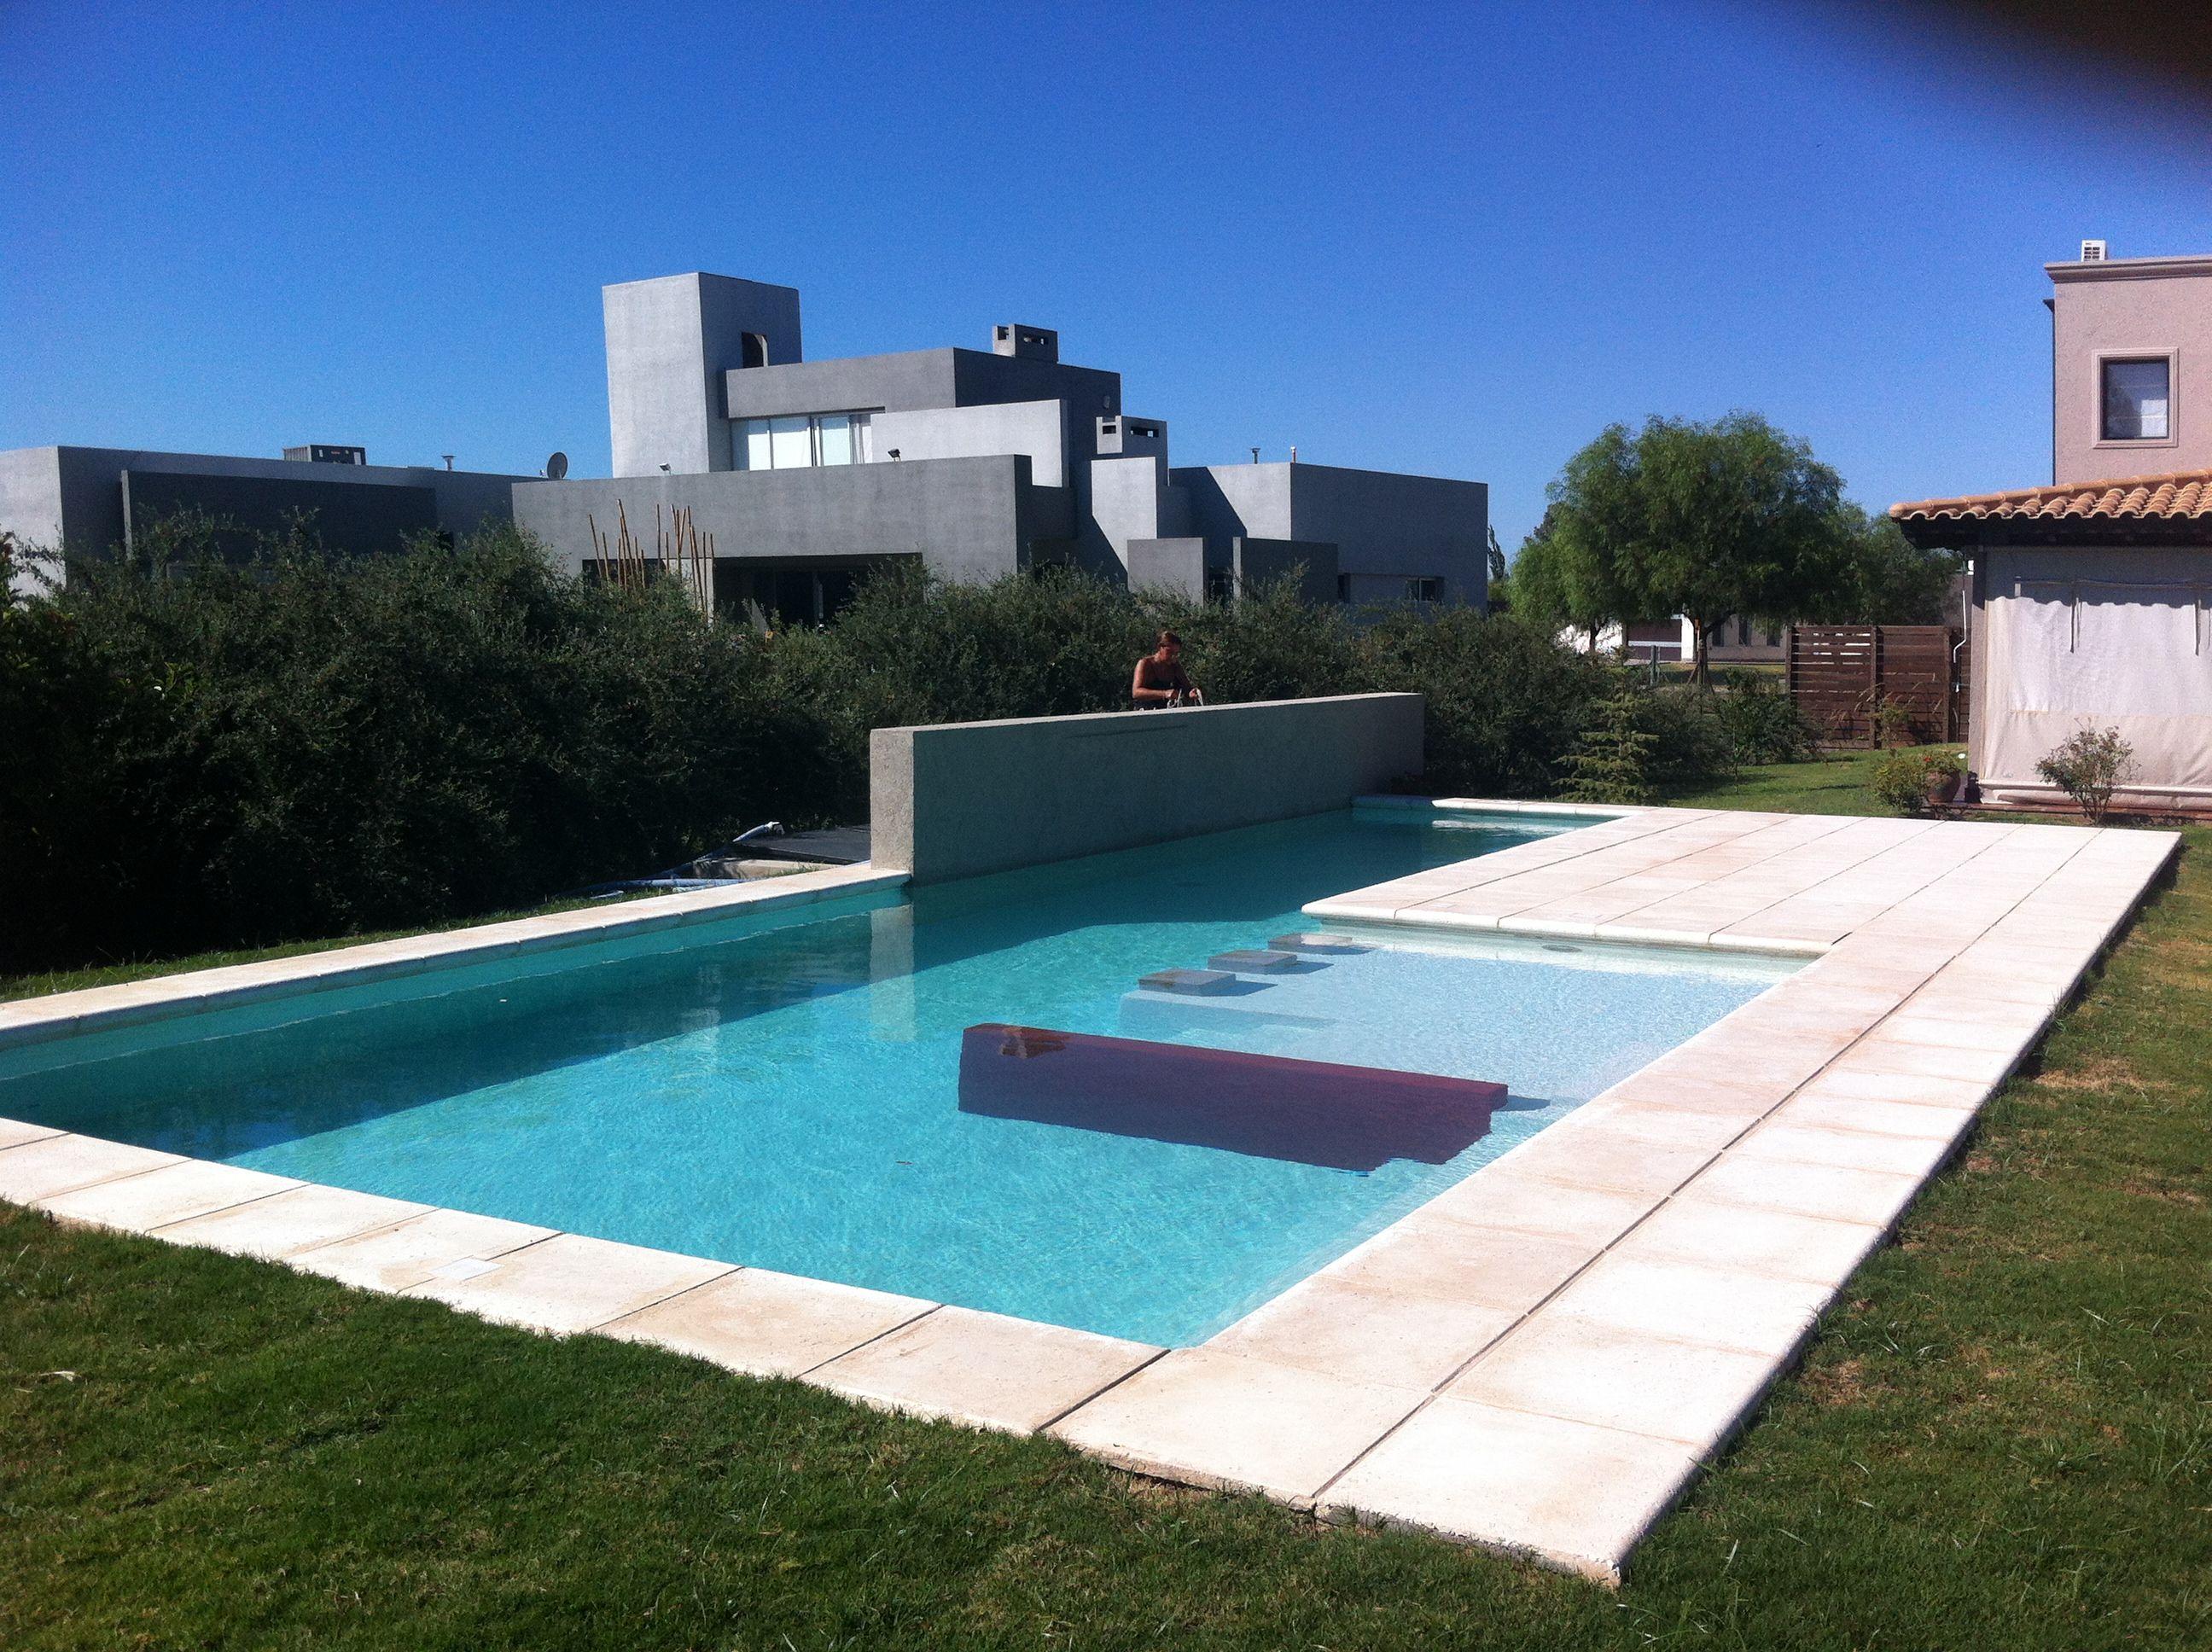 piscinas - swimmingpool - wellnes - arquitectura - diseño